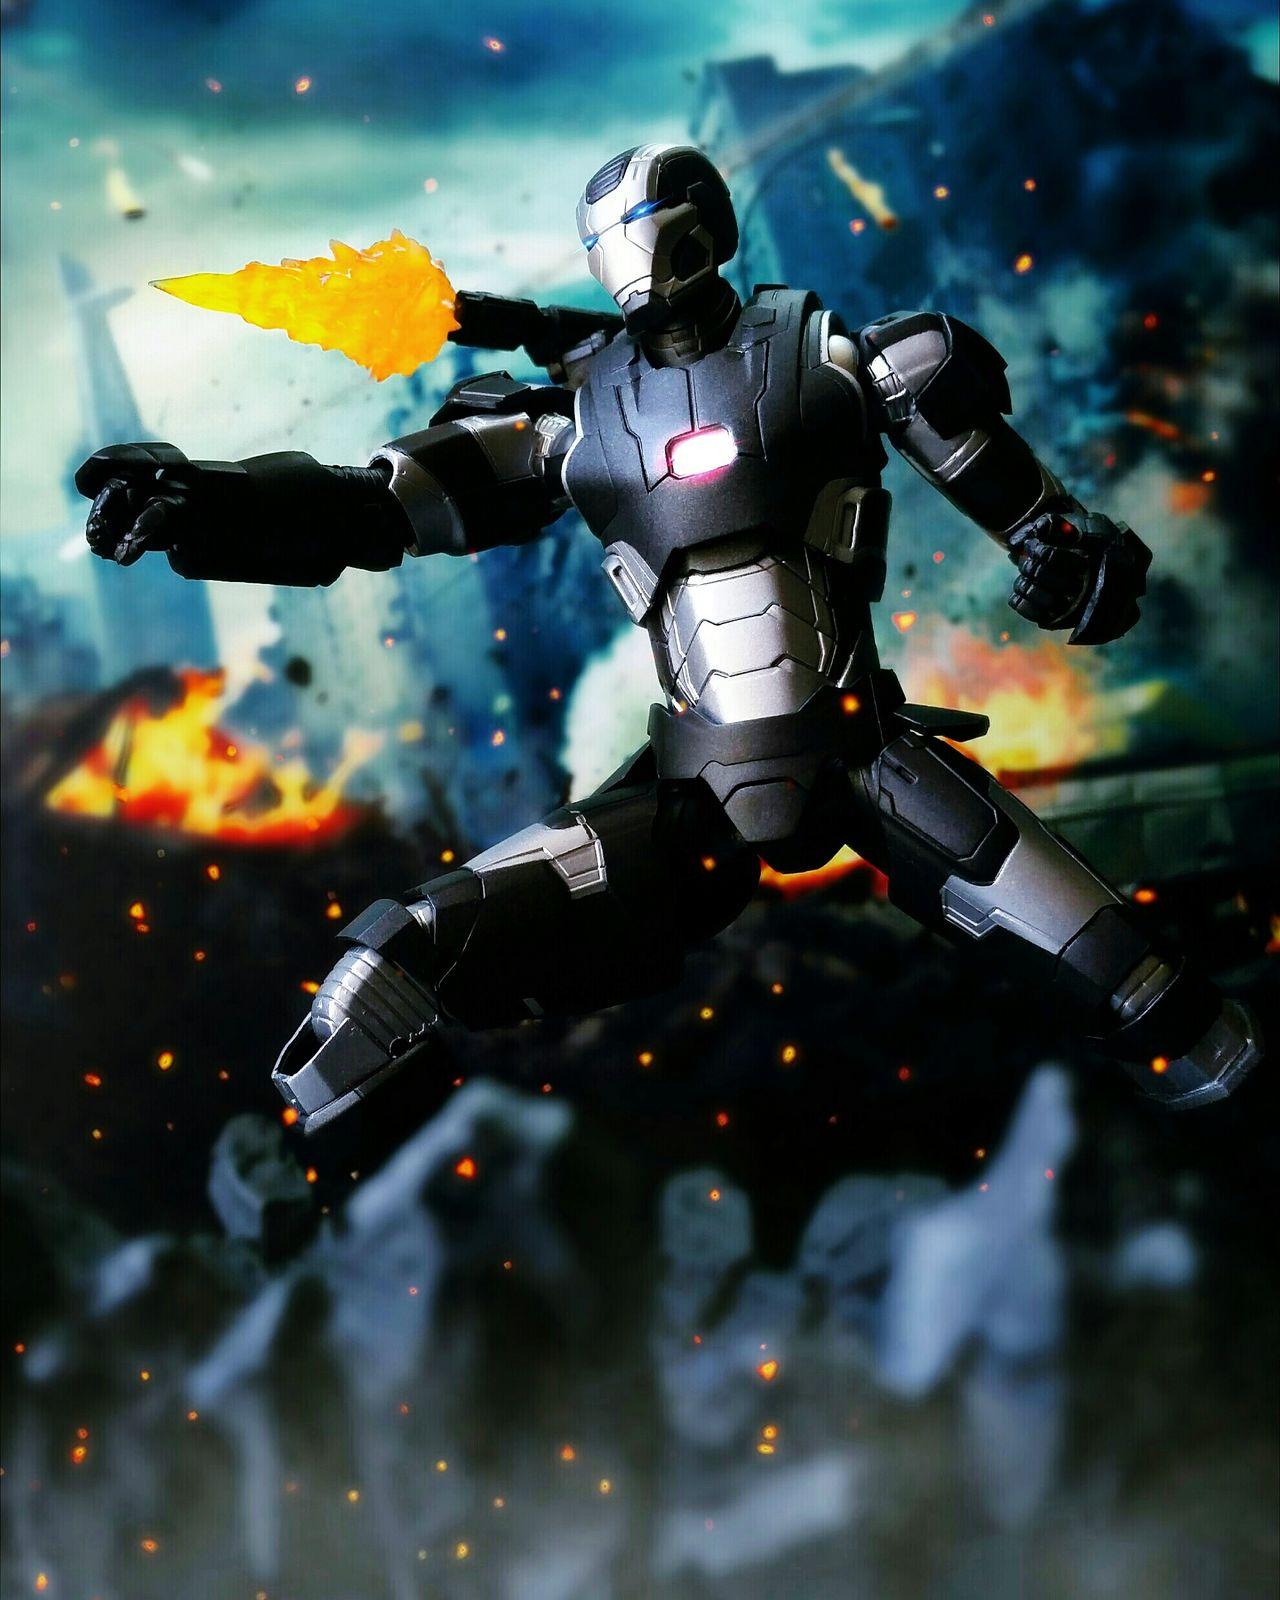 War Machine Mark 2 Toy Photography Tamashiinations Action Figures BANDAI Age Of Ultron Marvel Sh Figuarts Shf War Machine